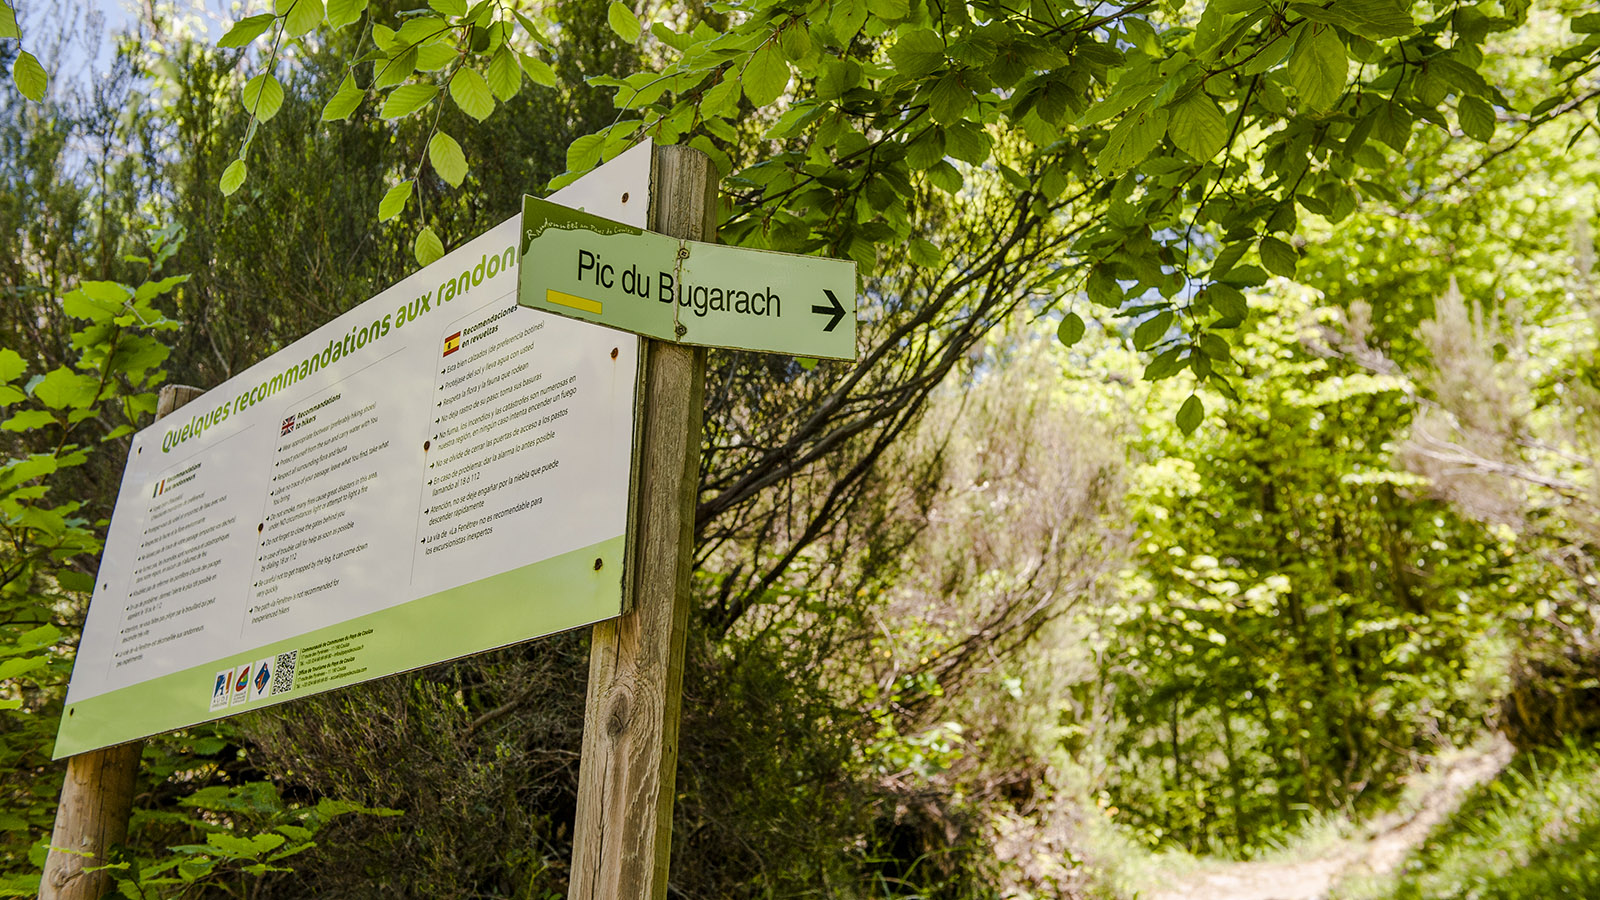 Pech de Bugarach: Start zum schwierigen Aufstieg... Foto: Hilke Maunder